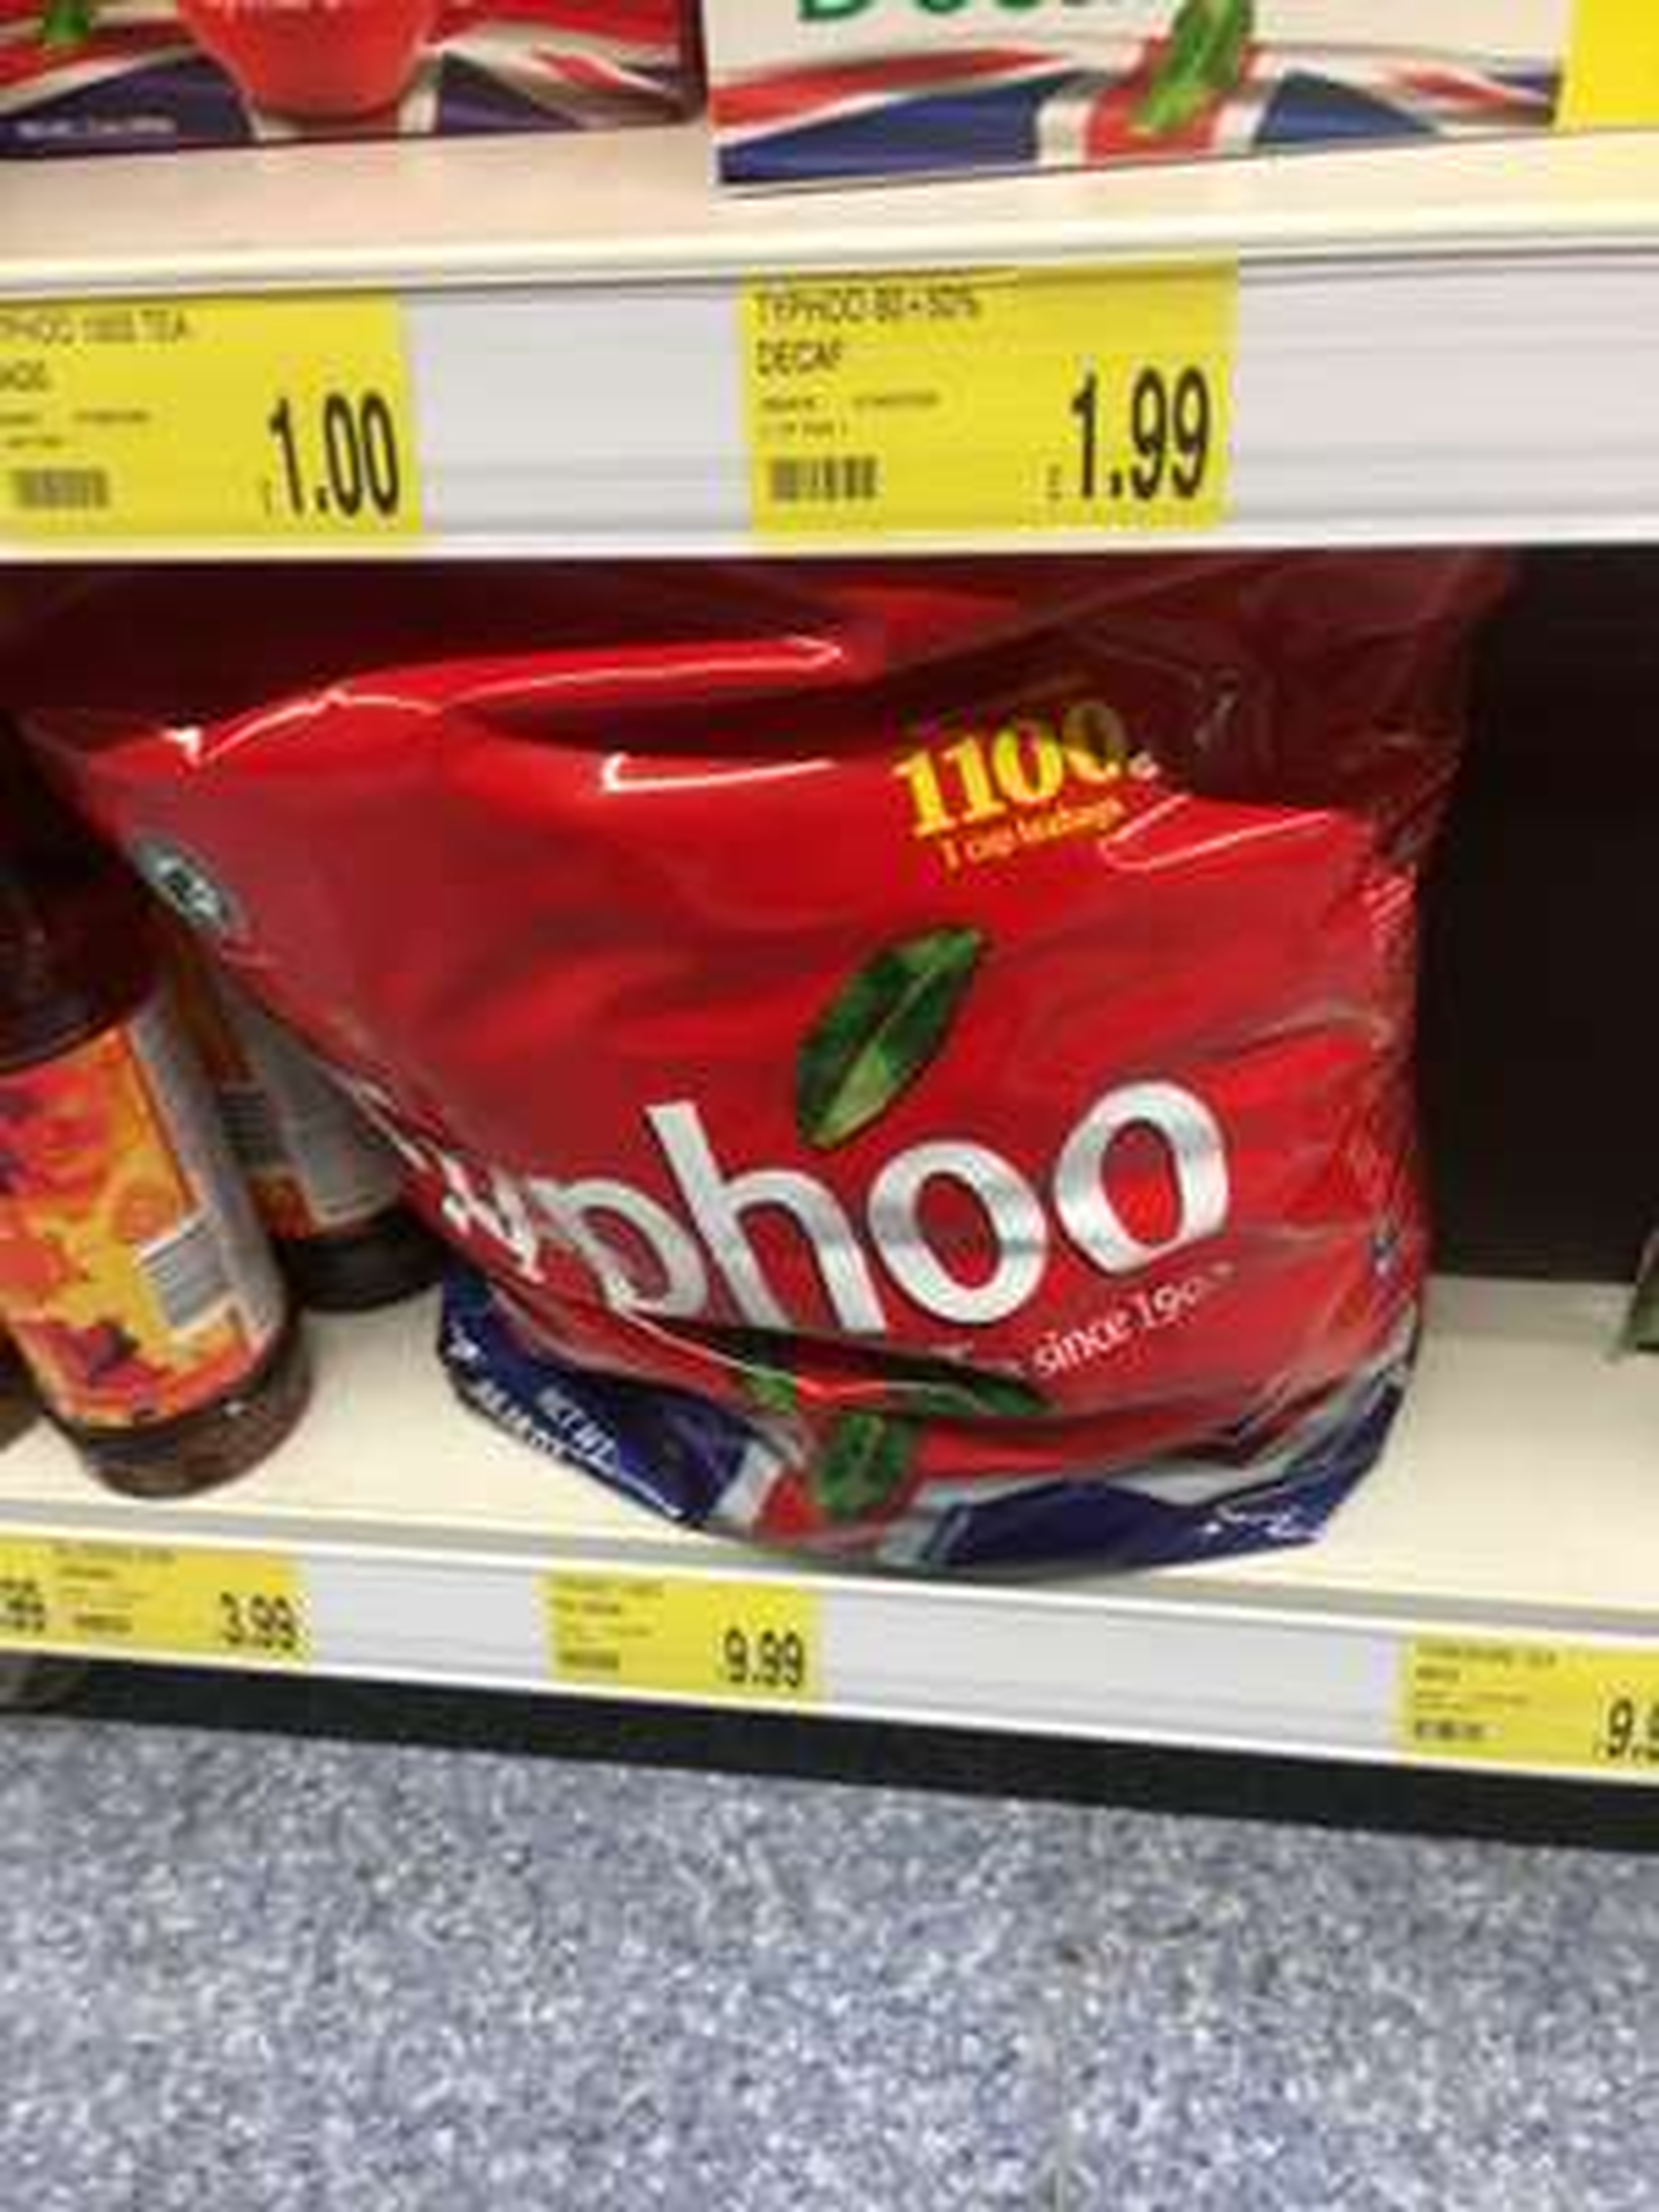 1100 typhoo  tea bags one cup £9.99 @ B&M